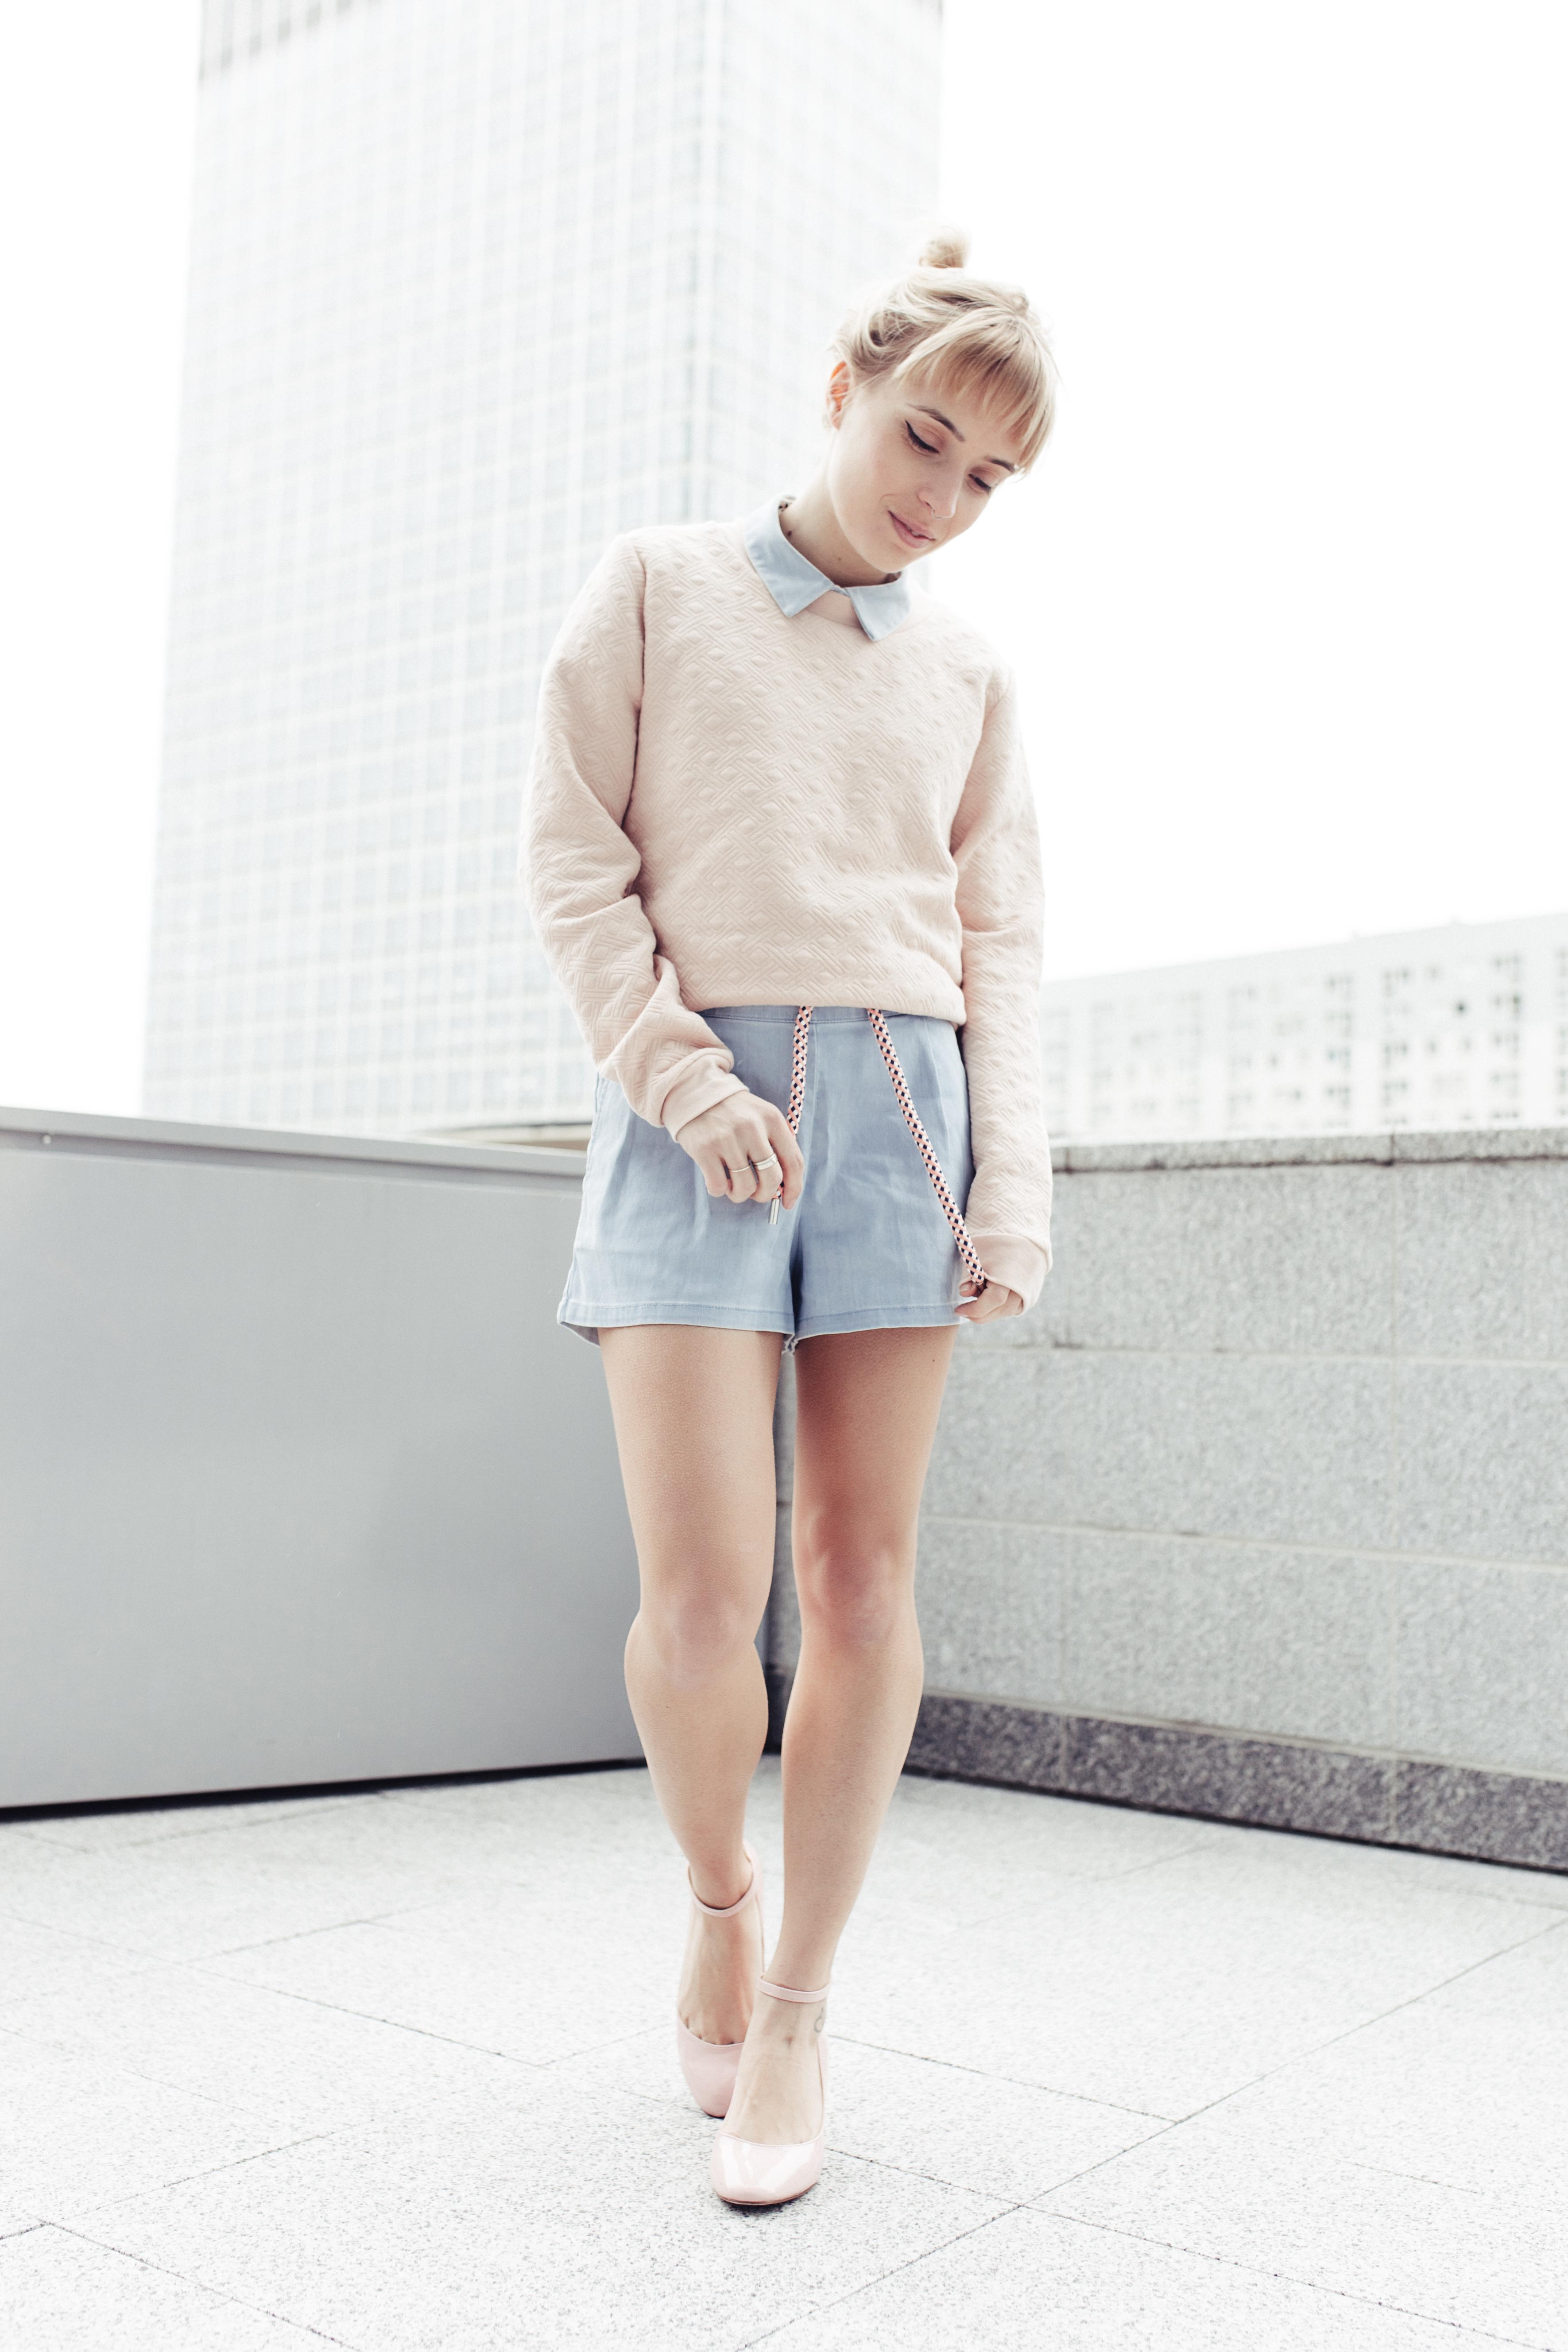 princessetamtam-astrid-lyloutte-17